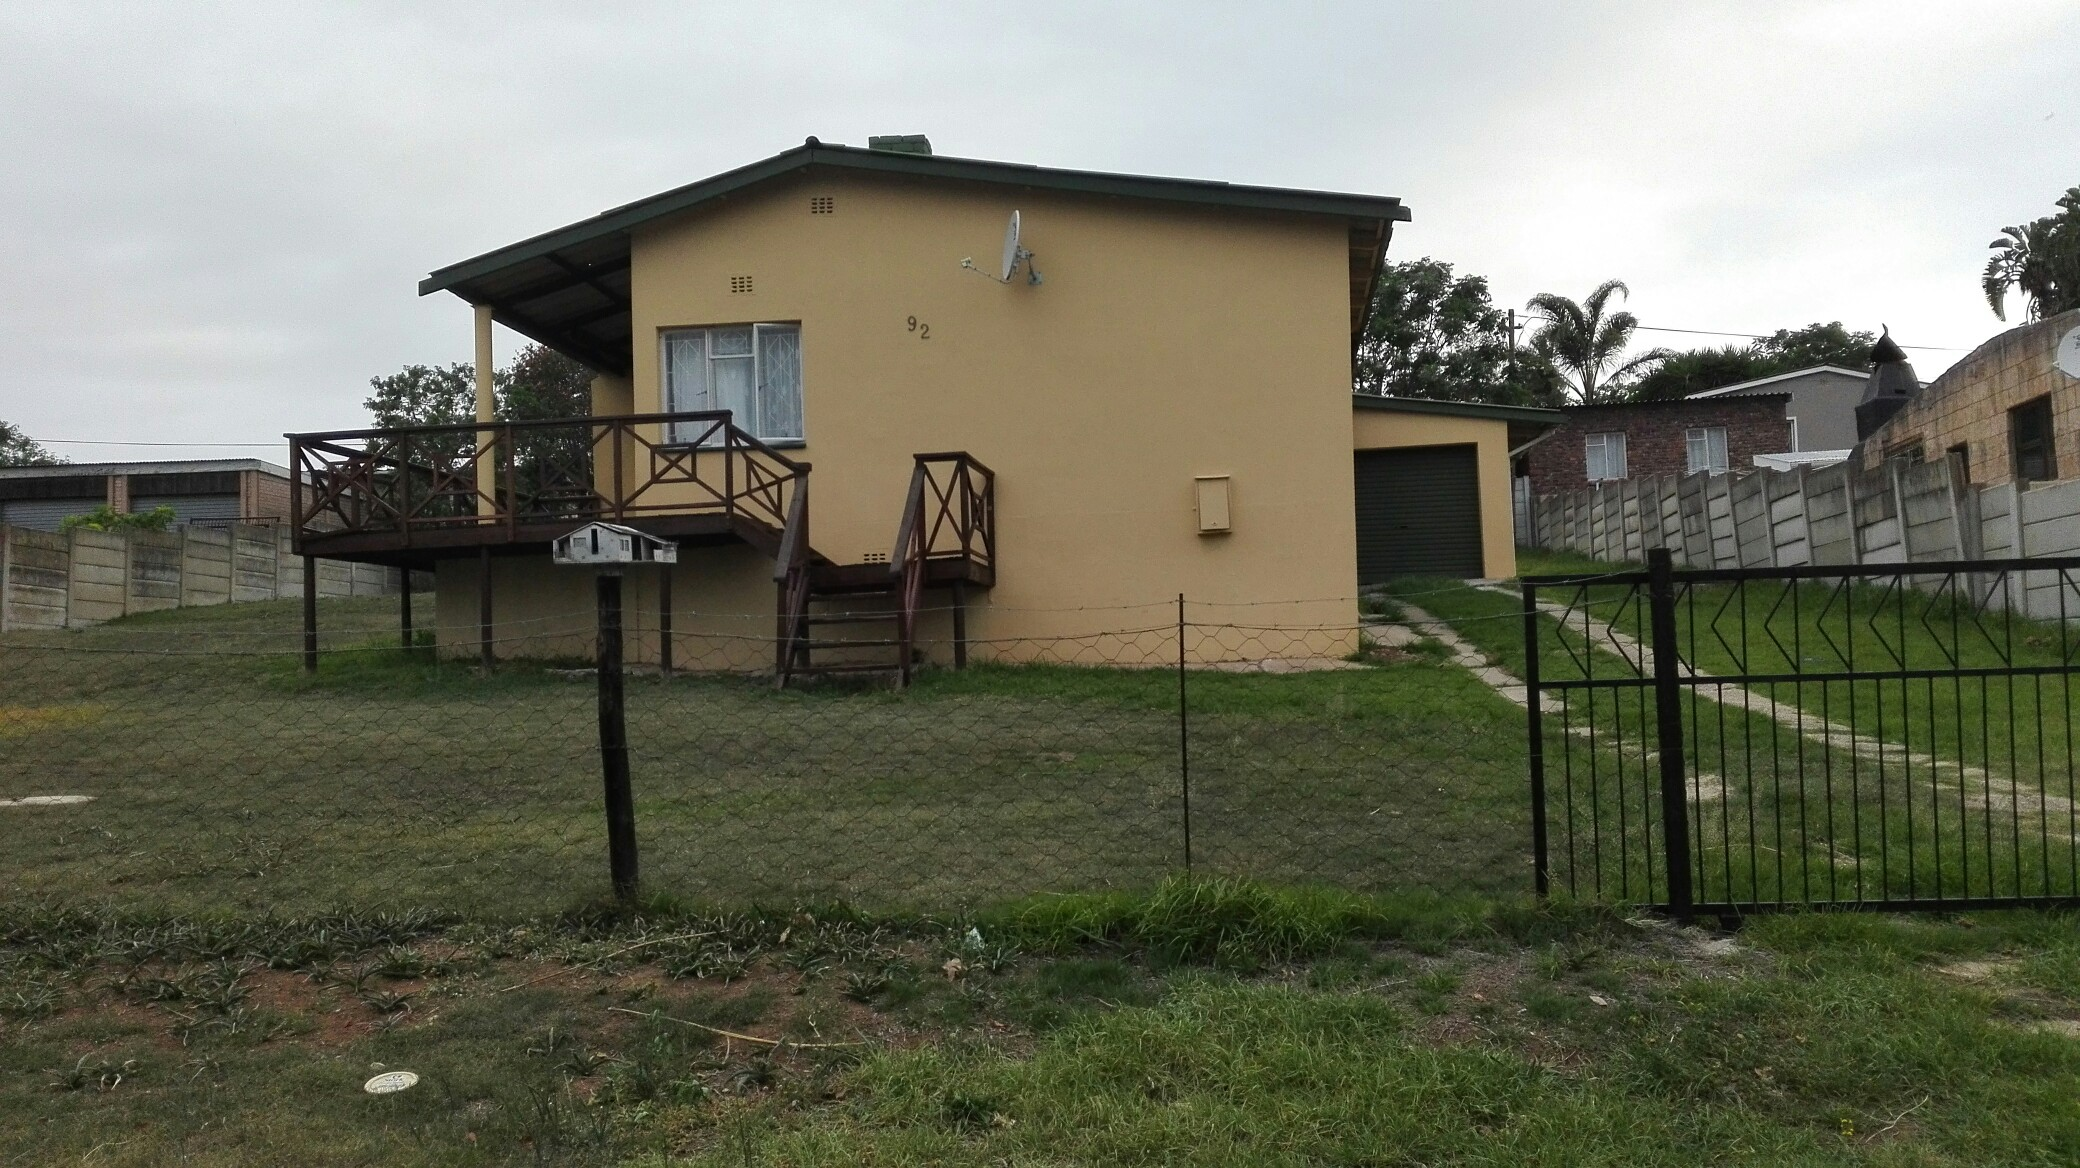 3 BedroomHouse For Sale In Fairbridge Heights